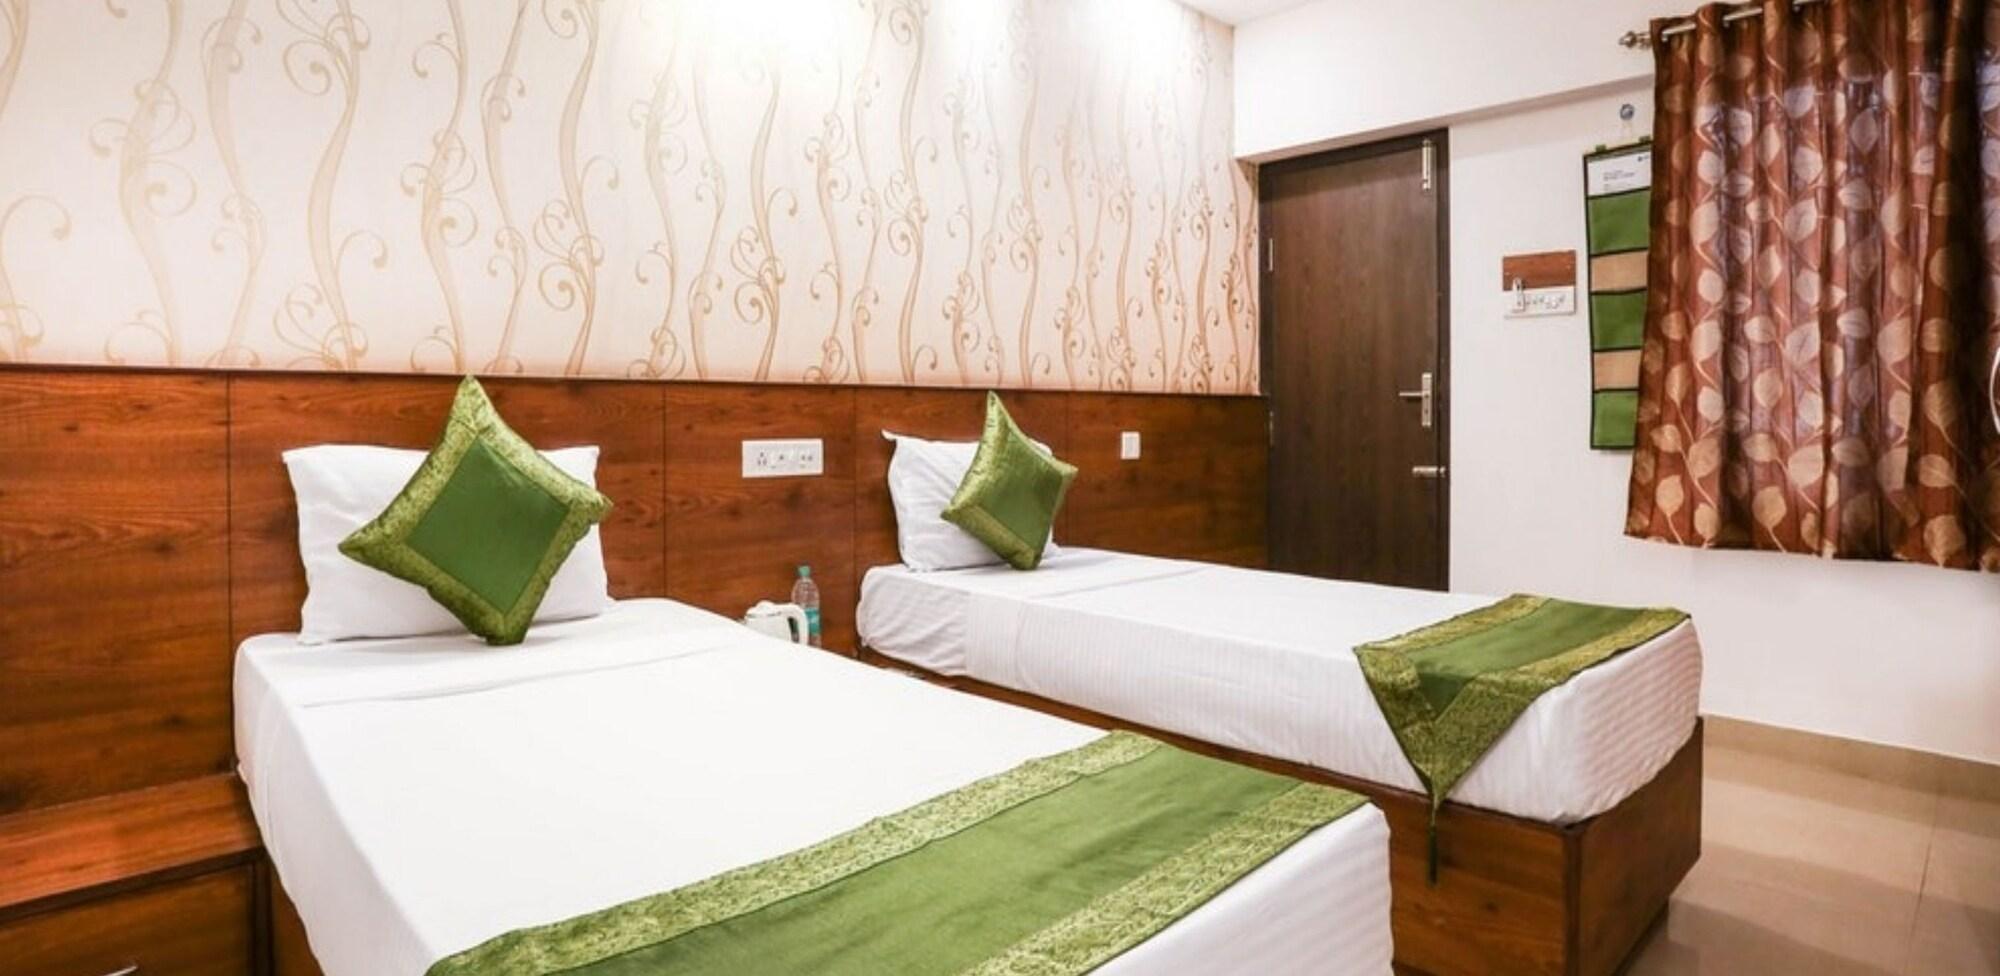 Book Hotel Poonja International with tajawal, Book Now at